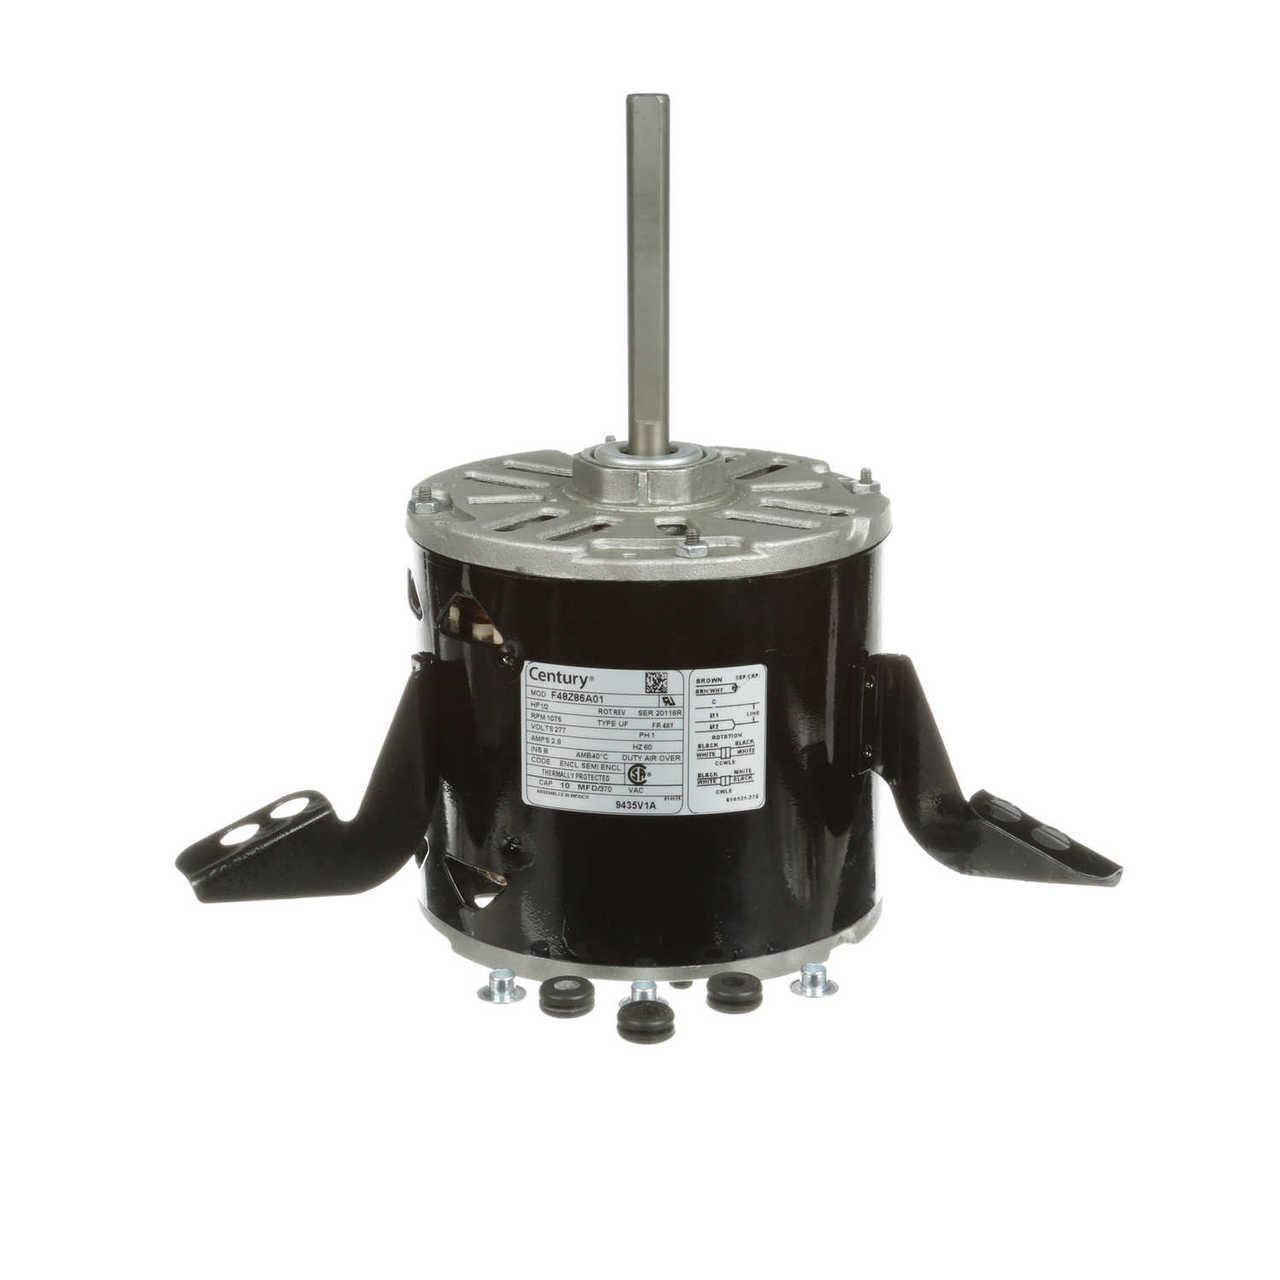 Dayton 1//6 HP Direct Drive Blower Motor 277 Volts